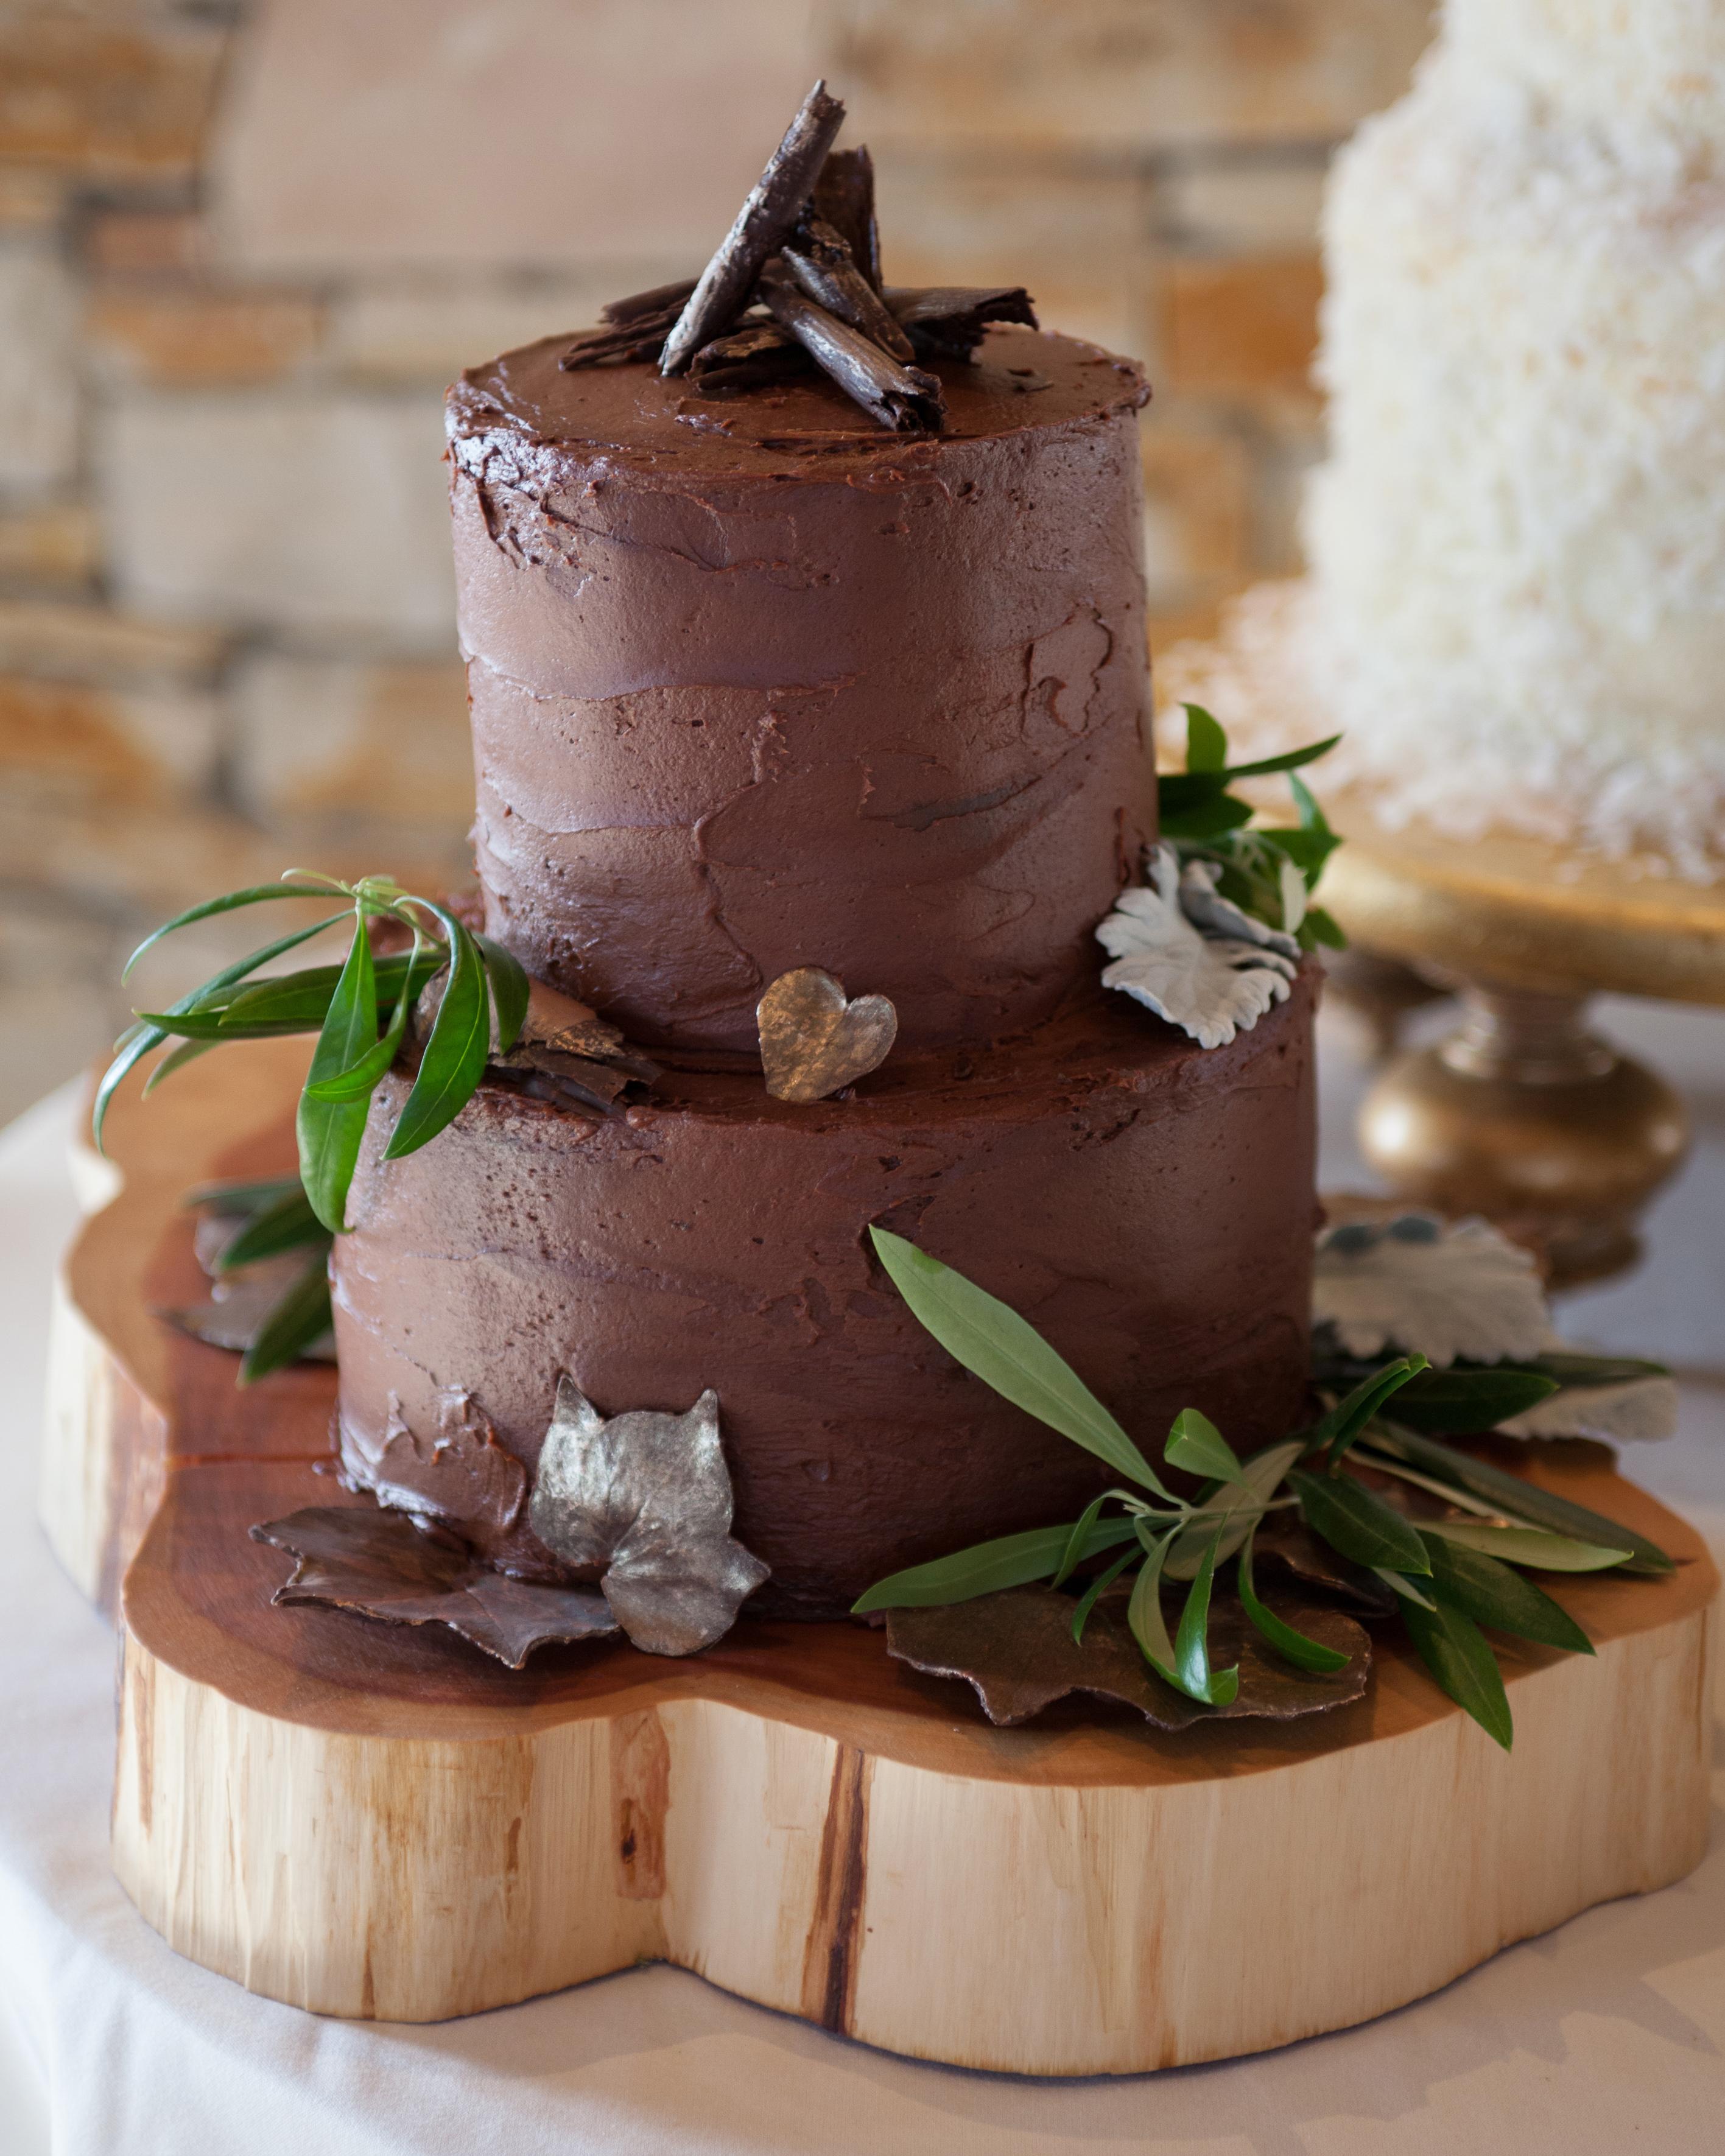 kristin-chris-wedding-cake-409-s112398-0116.jpg